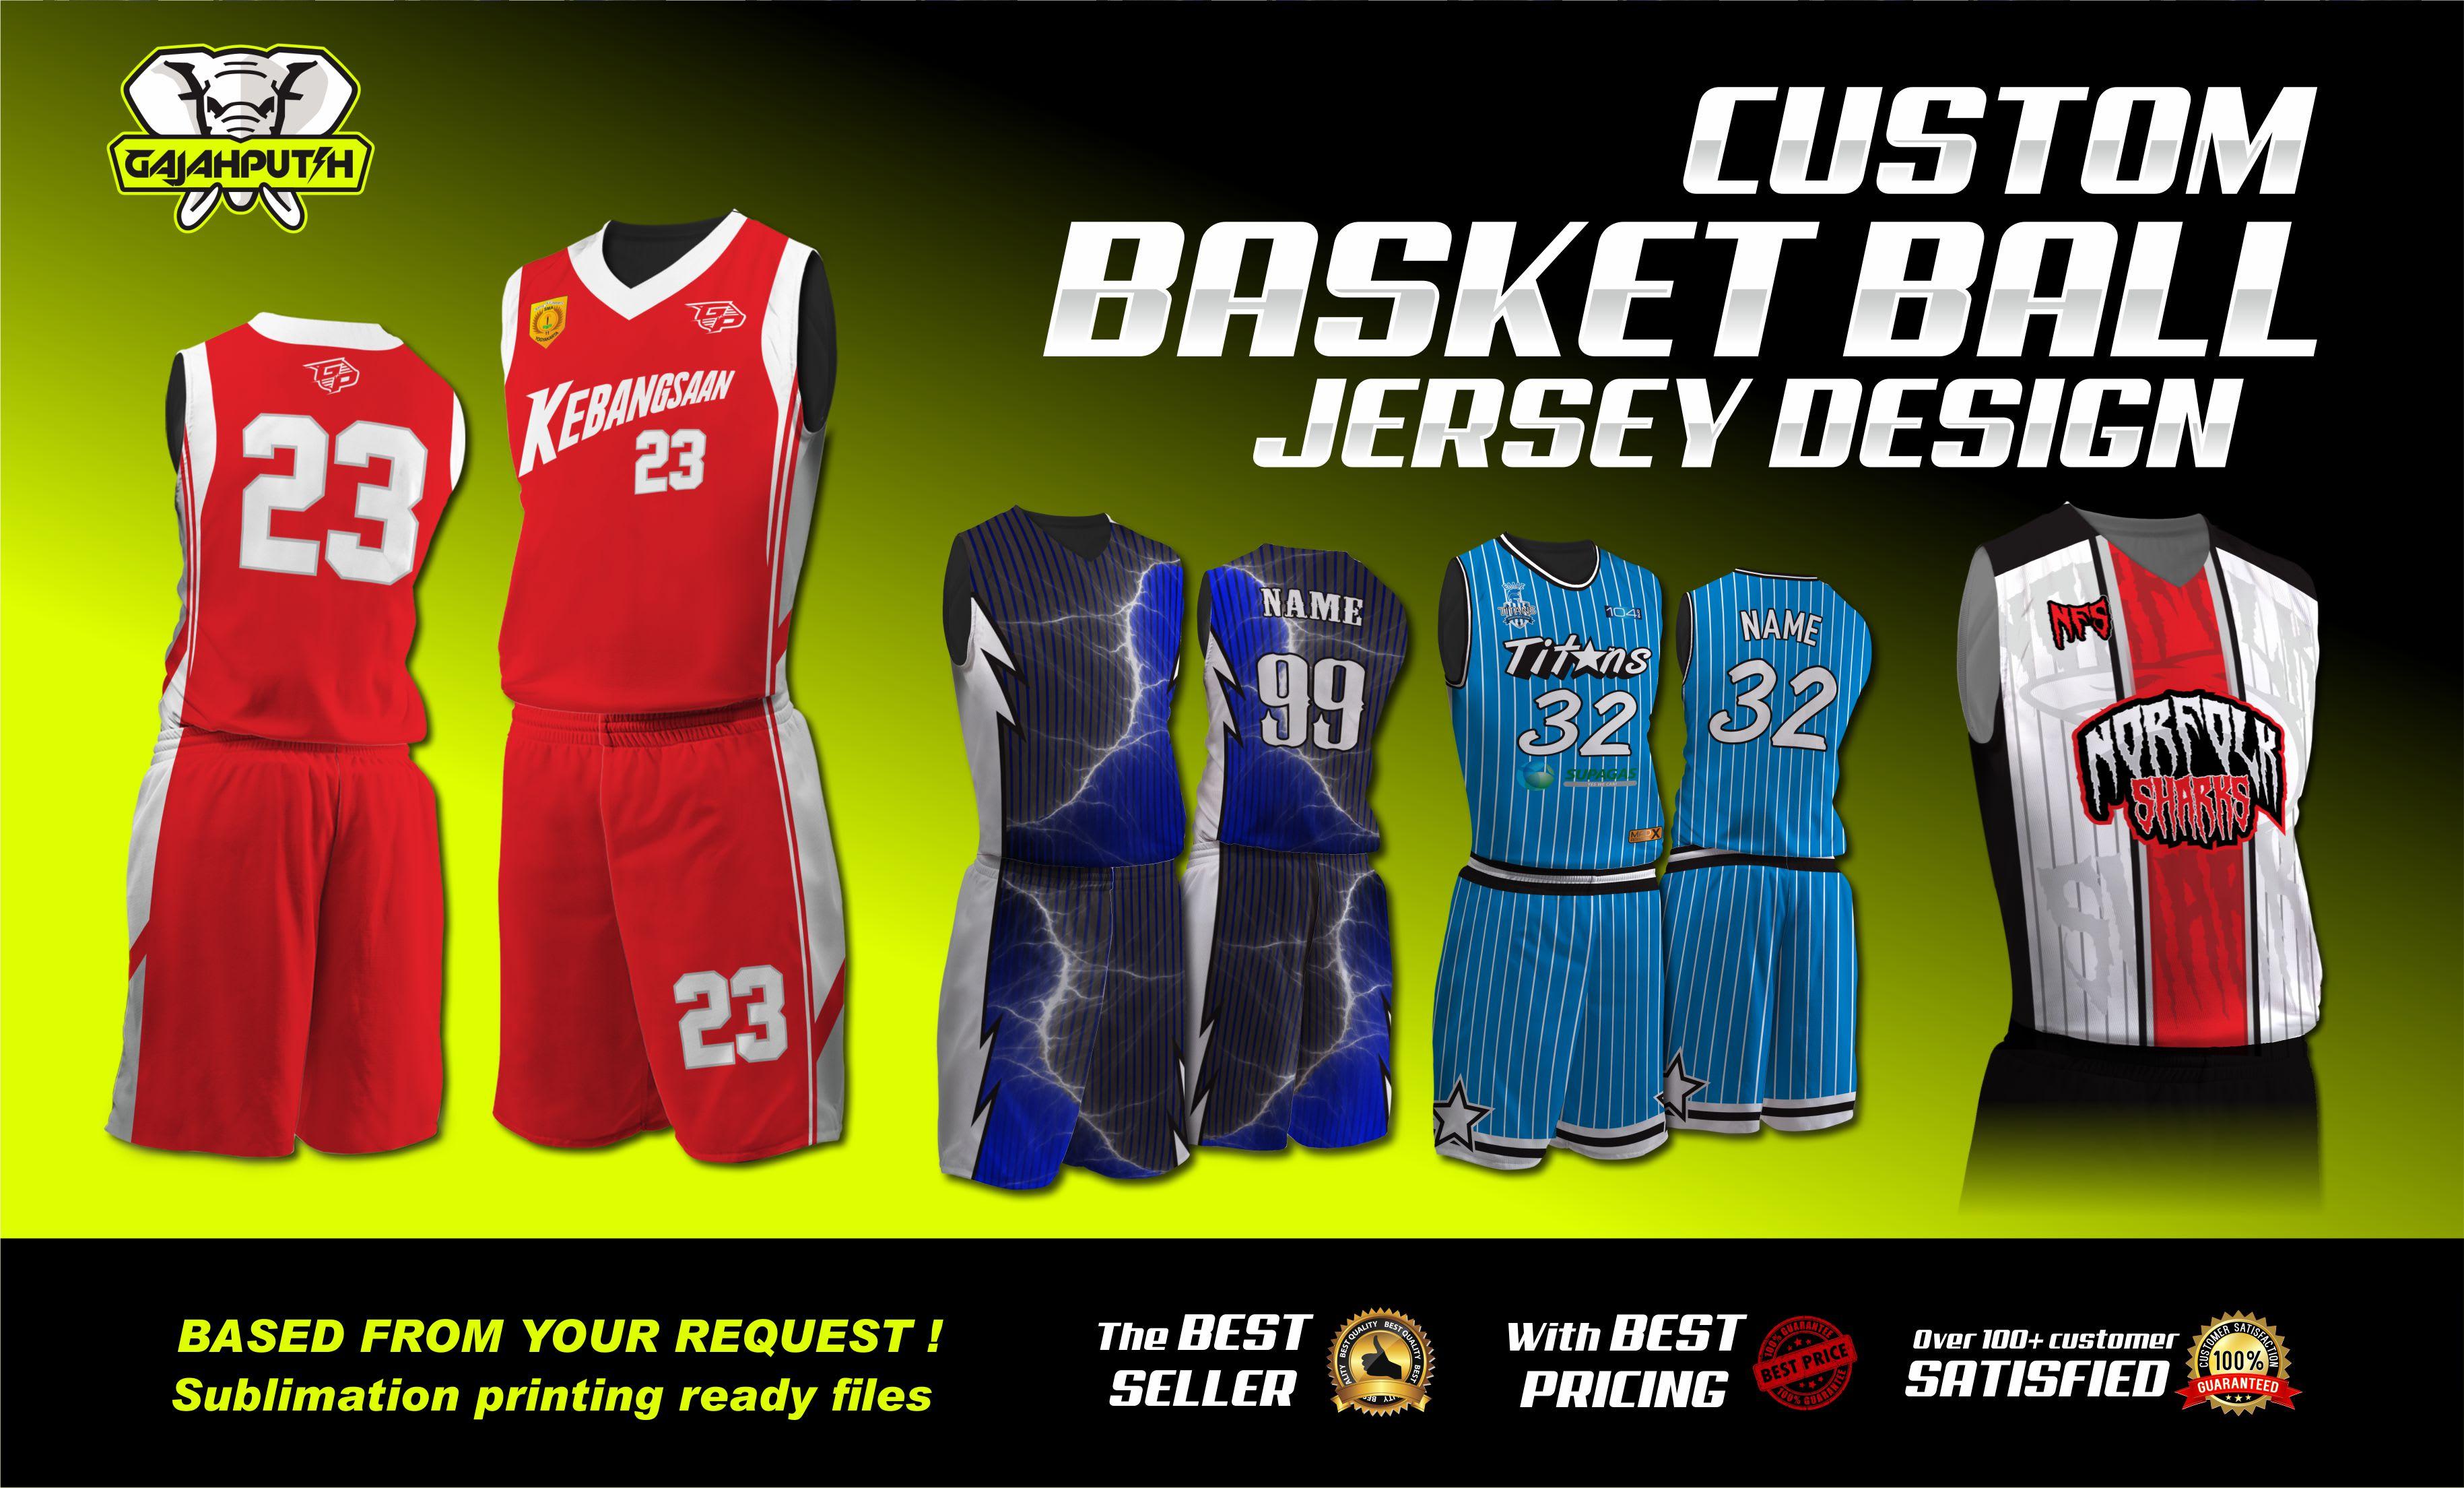 Make Basketball Jersey Designs Sublimation Printing Based By Gajahputih